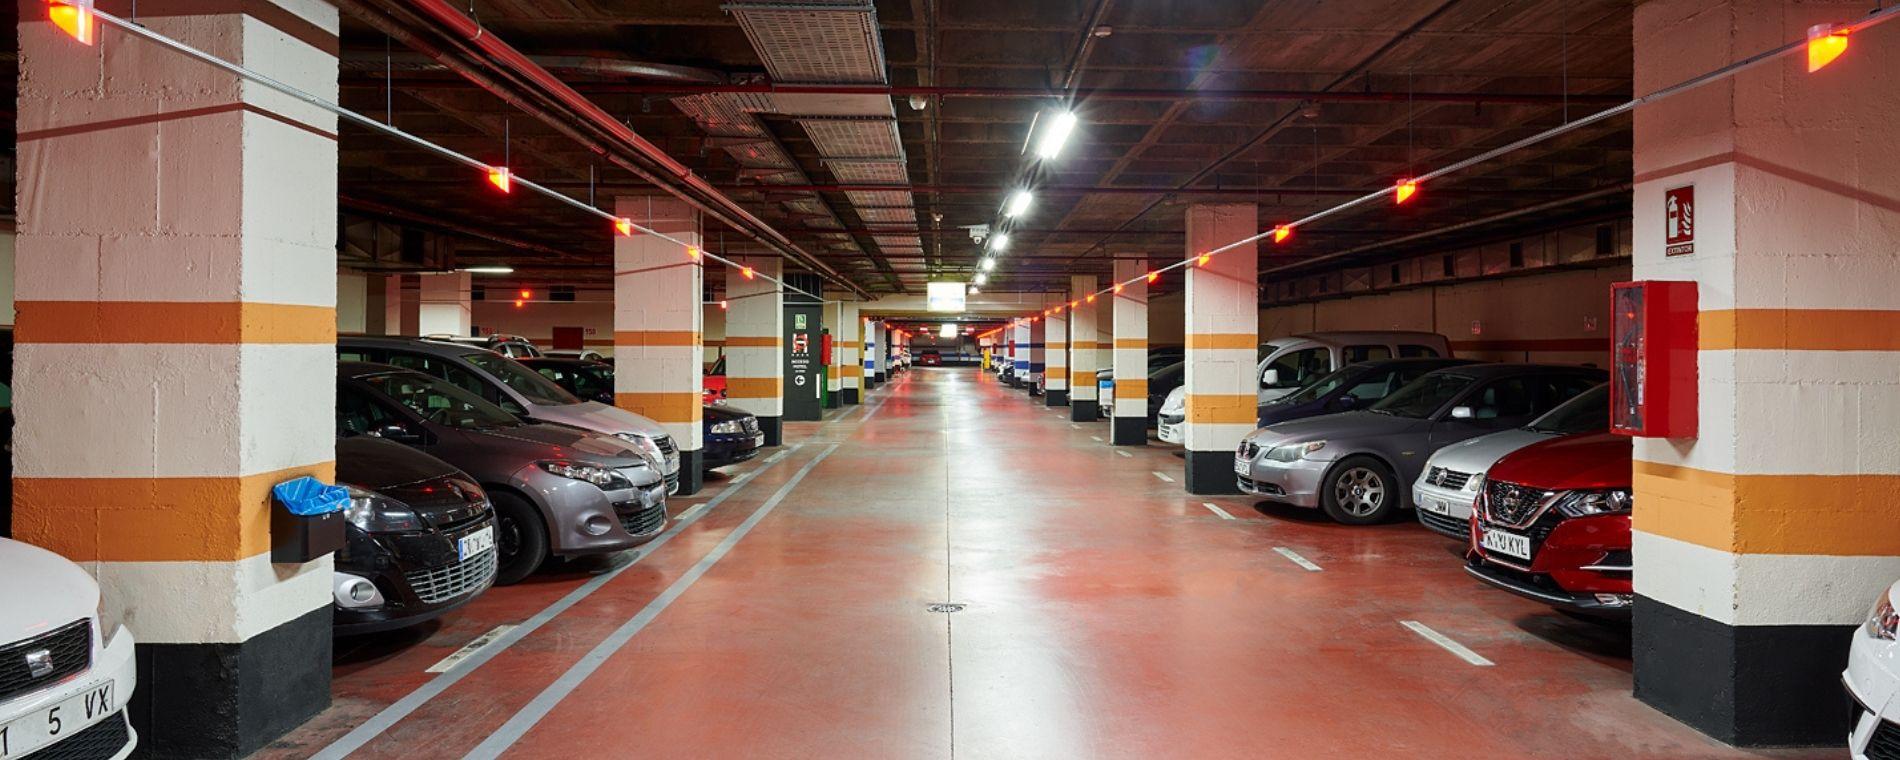 Parking corporativa delunaparking